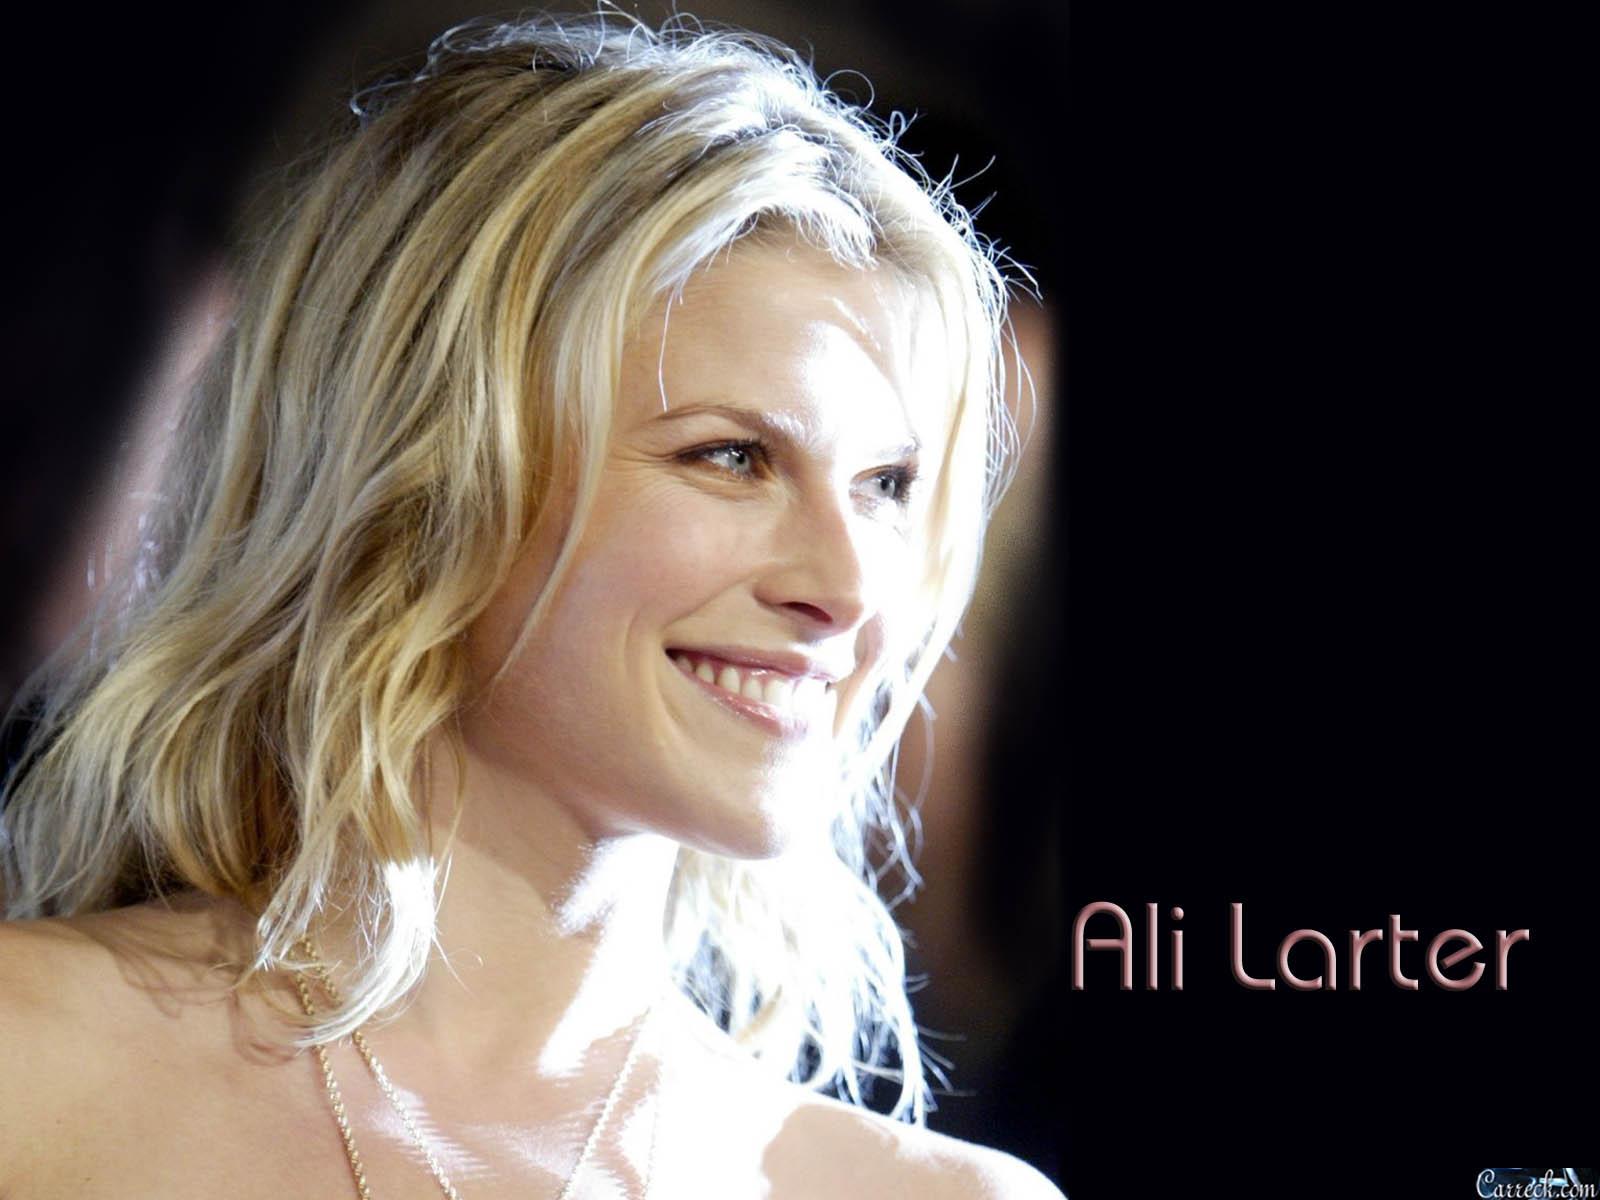 Ali Larter's quote #2